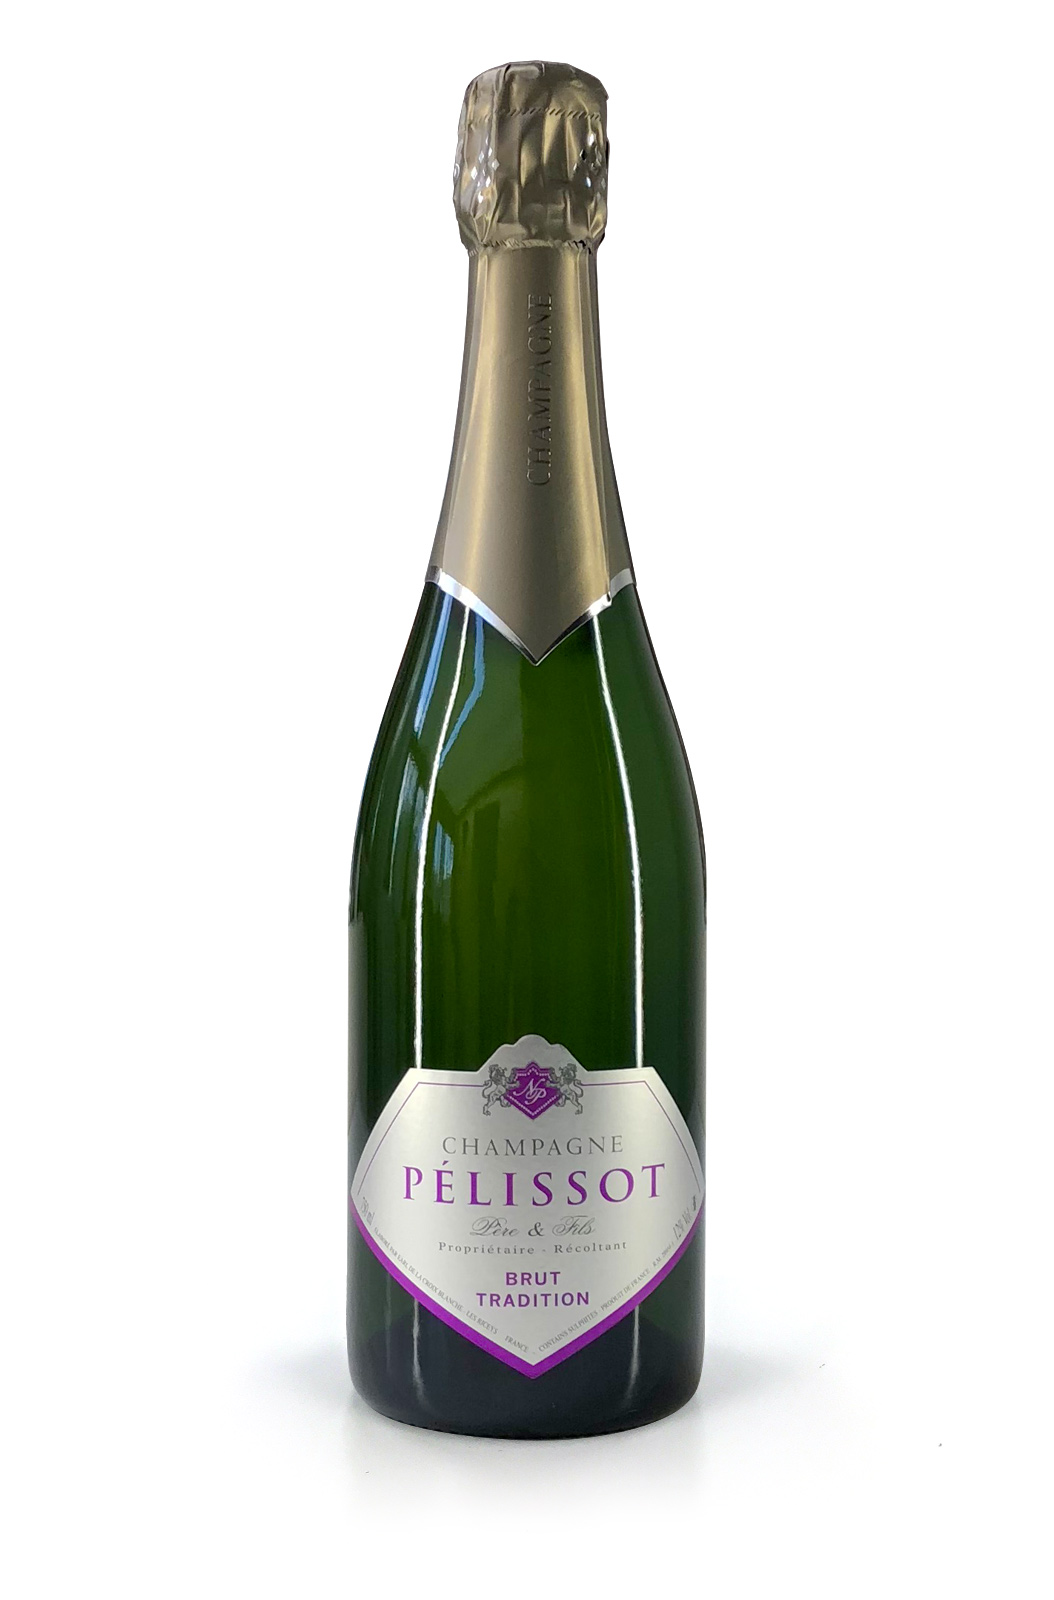 07-pelissot-champagne-brut-tradition-vins-et-spiritueux